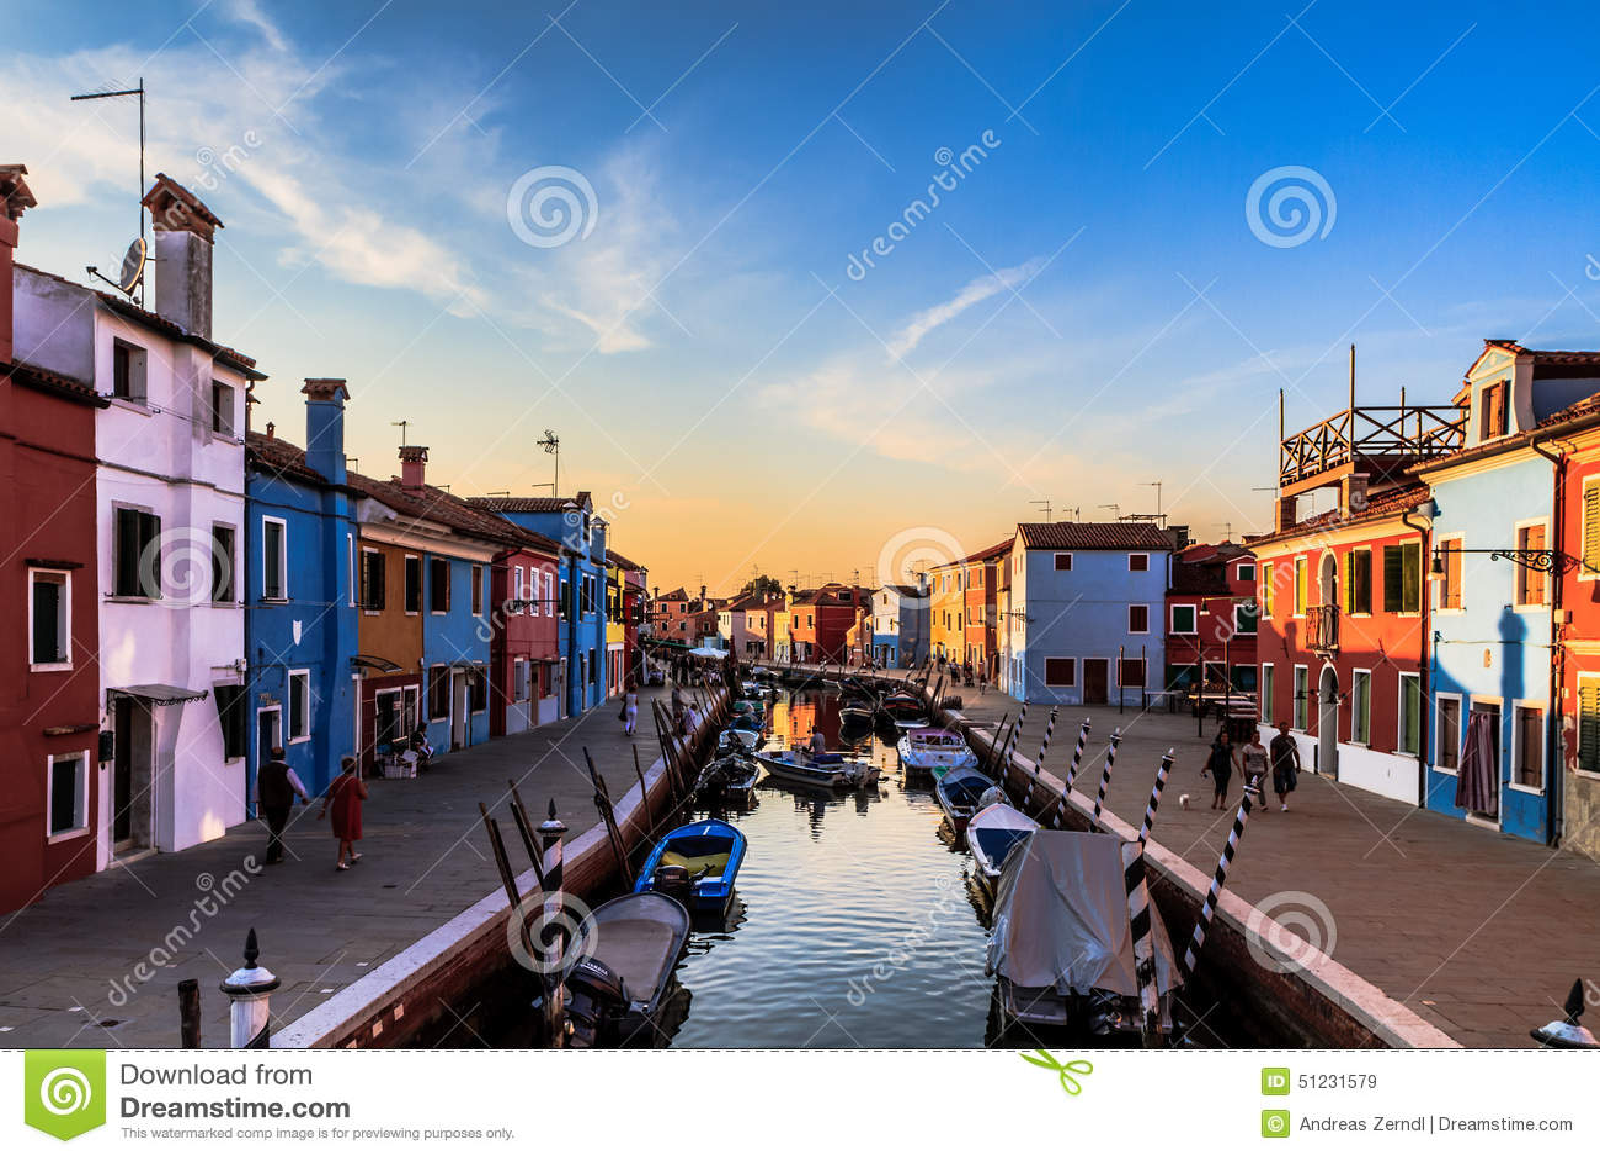 Colorful burano italy burano tourism - Colorful Burano Italy Burano Tourism 1